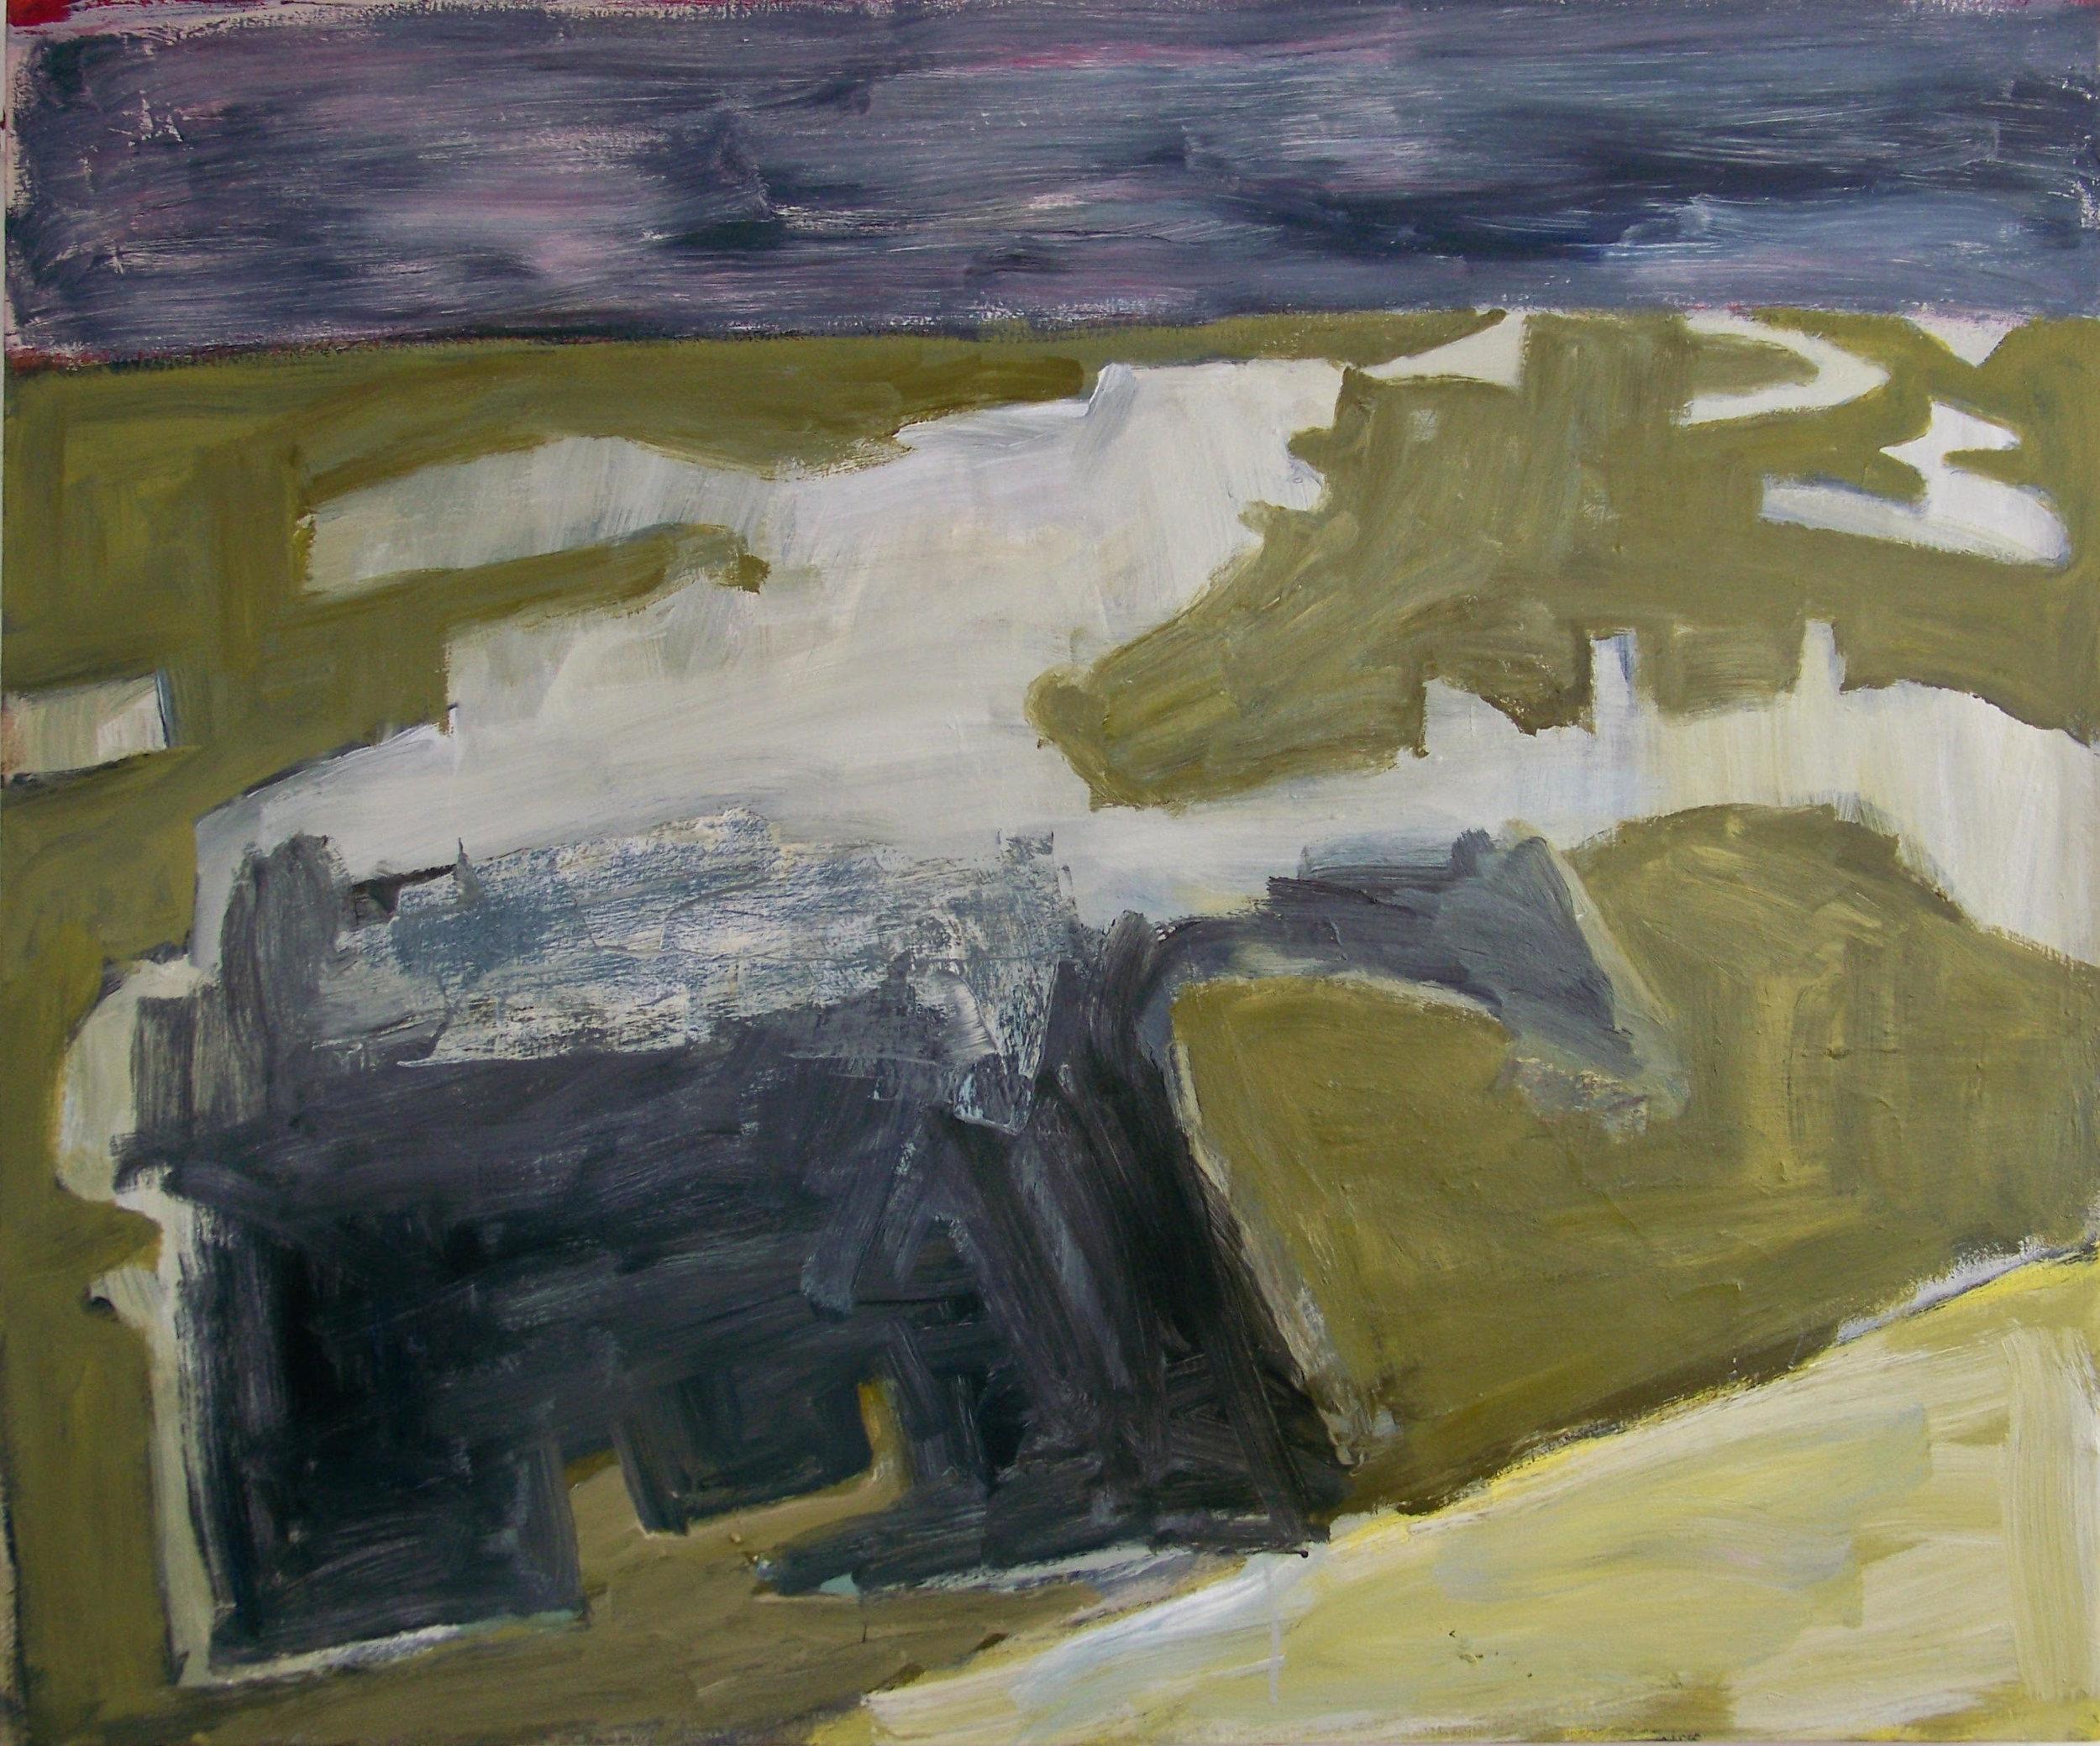 Sluice at High Tide , 2017. Acrylic on canvas, 100 x 120 cm